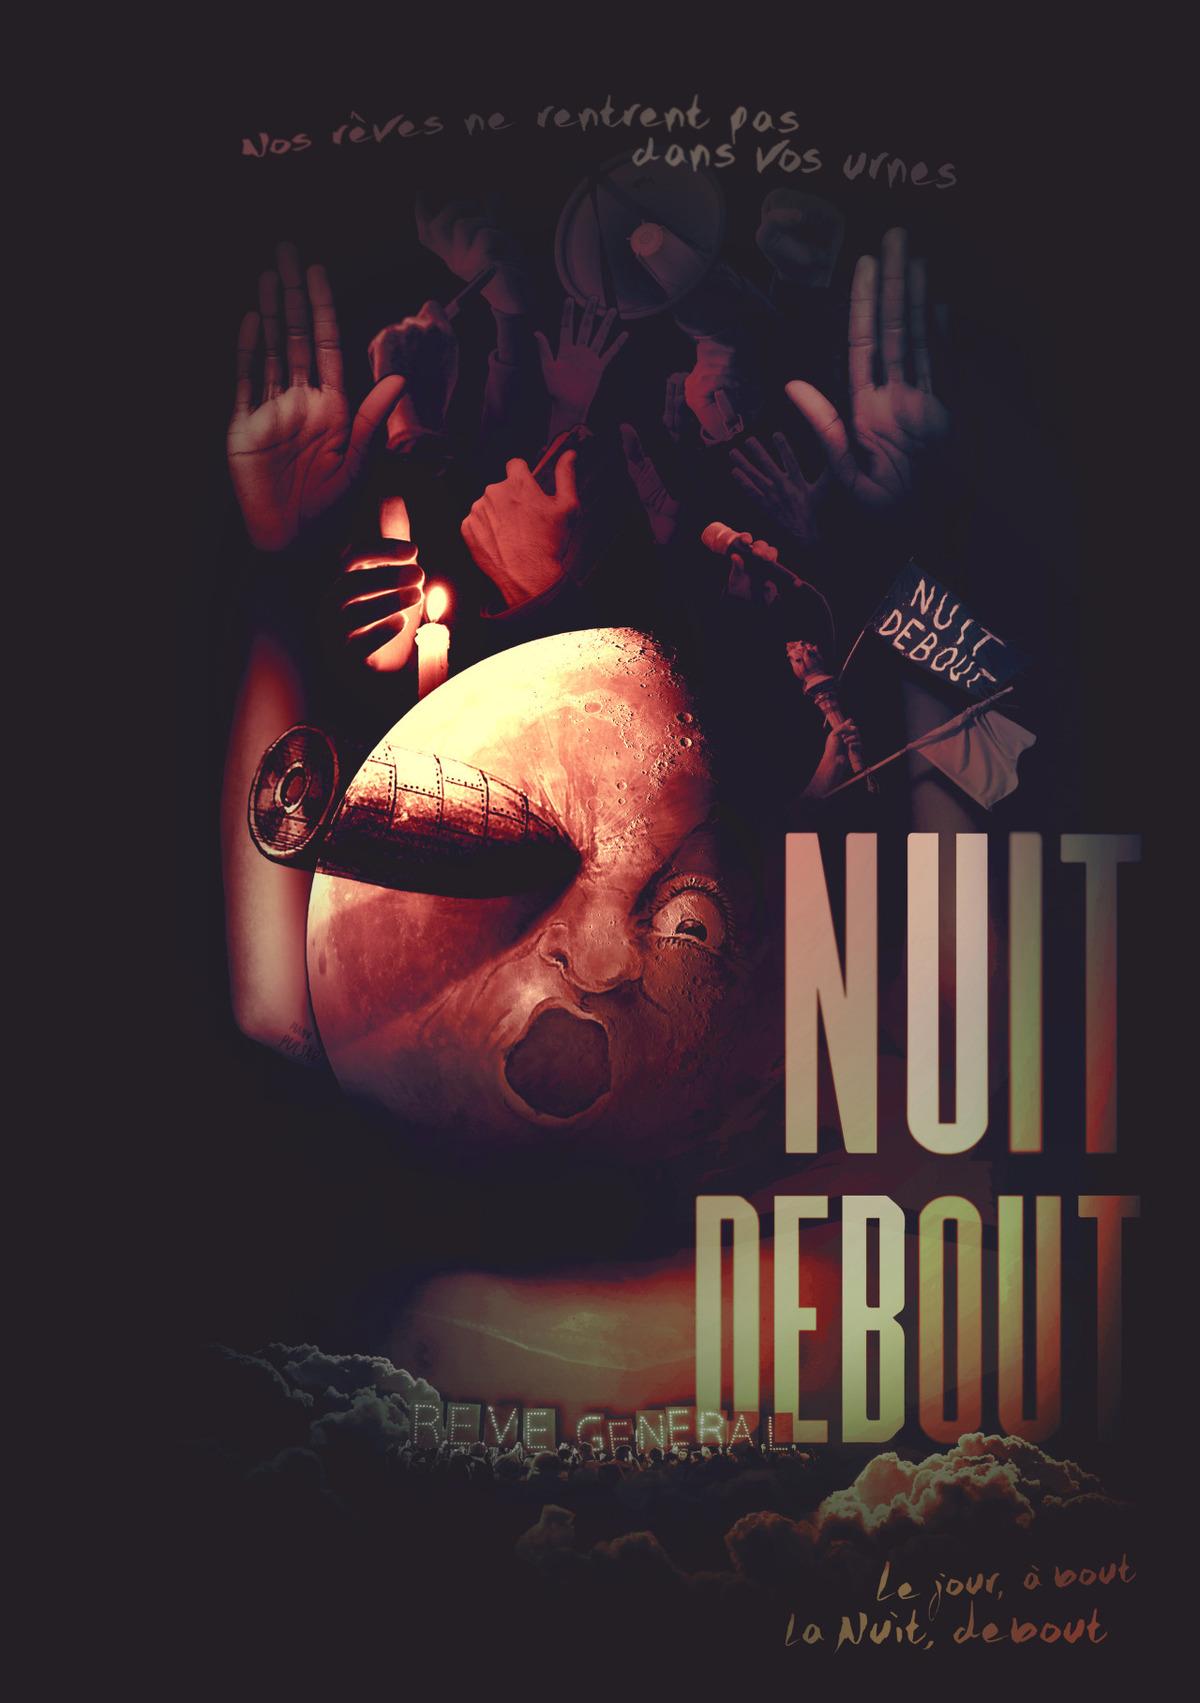 Comprendre Nuit Debout